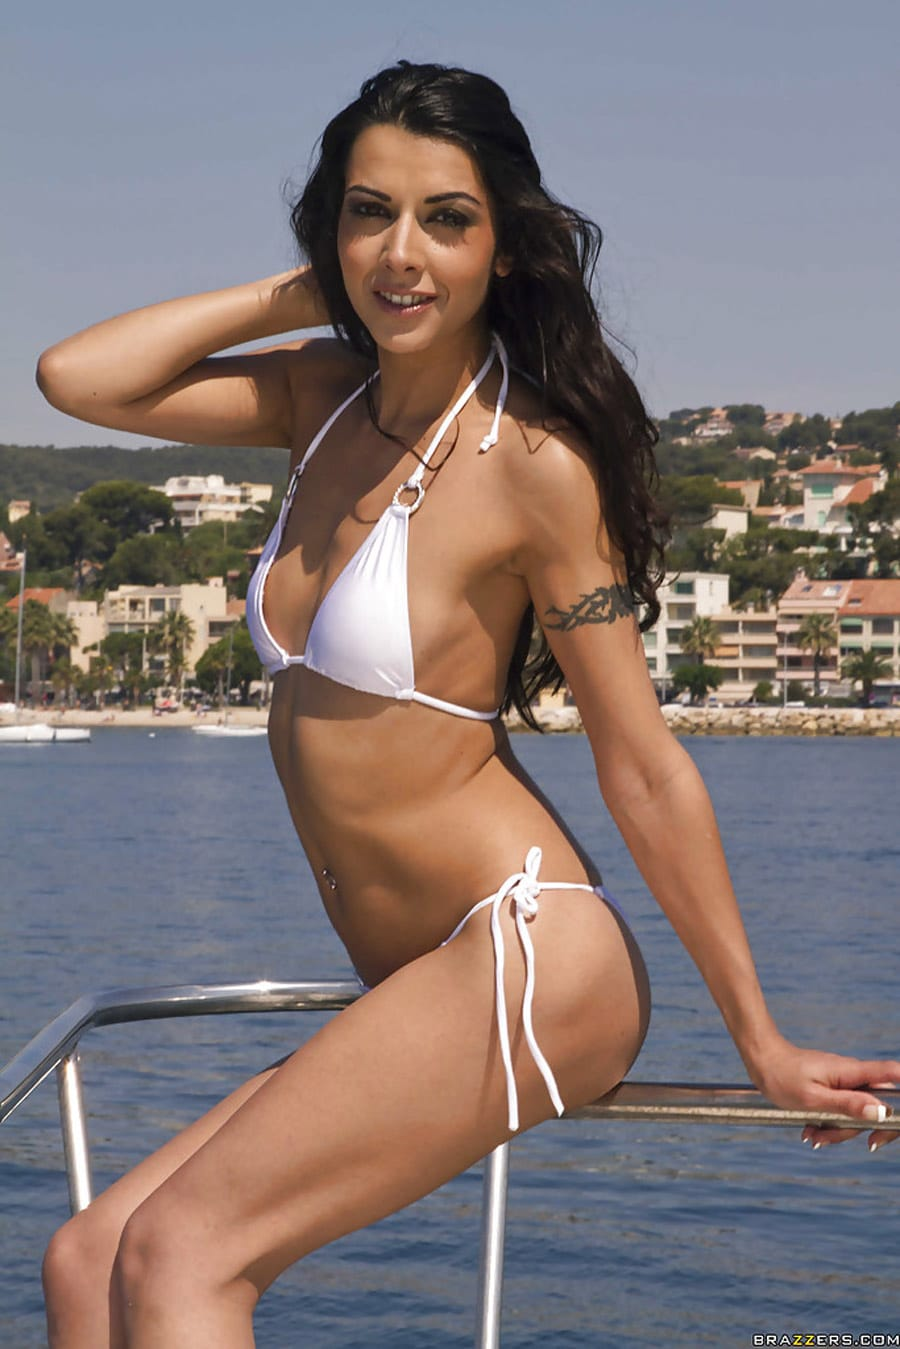 lou-charmelle-liza-del-sierra-partouze-yacht-brazzers-zz-series-3